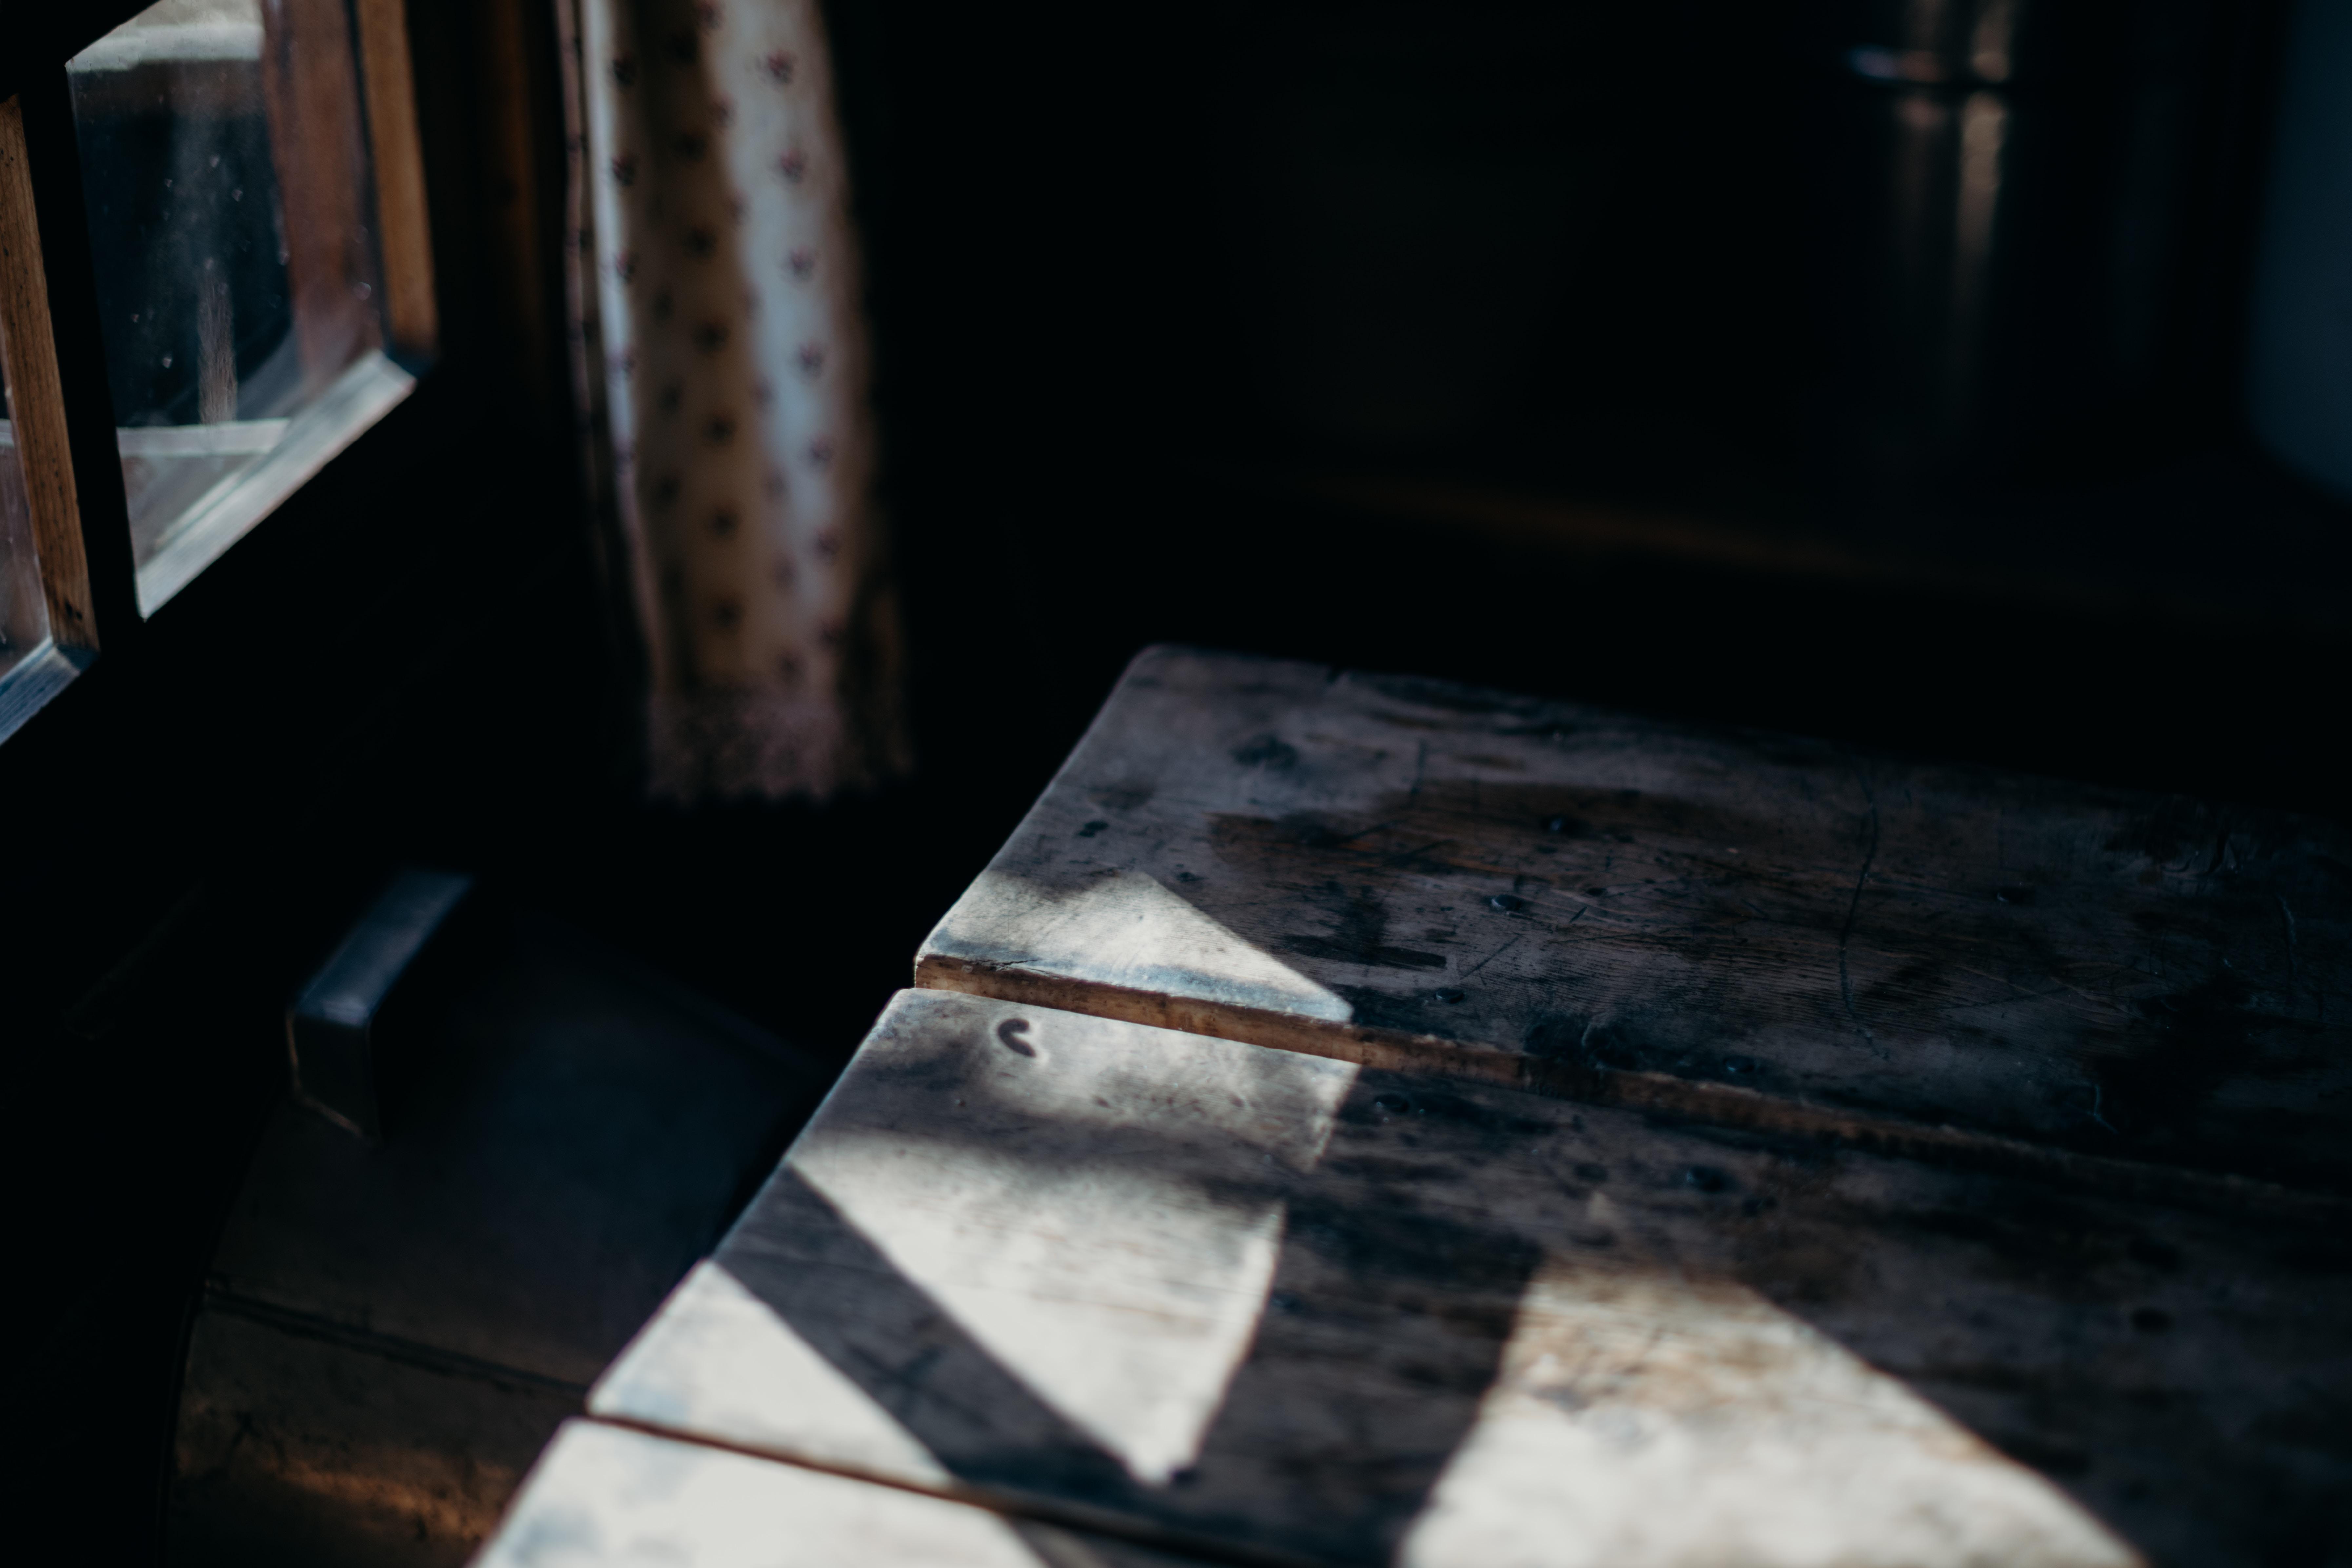 brown curtain inside room